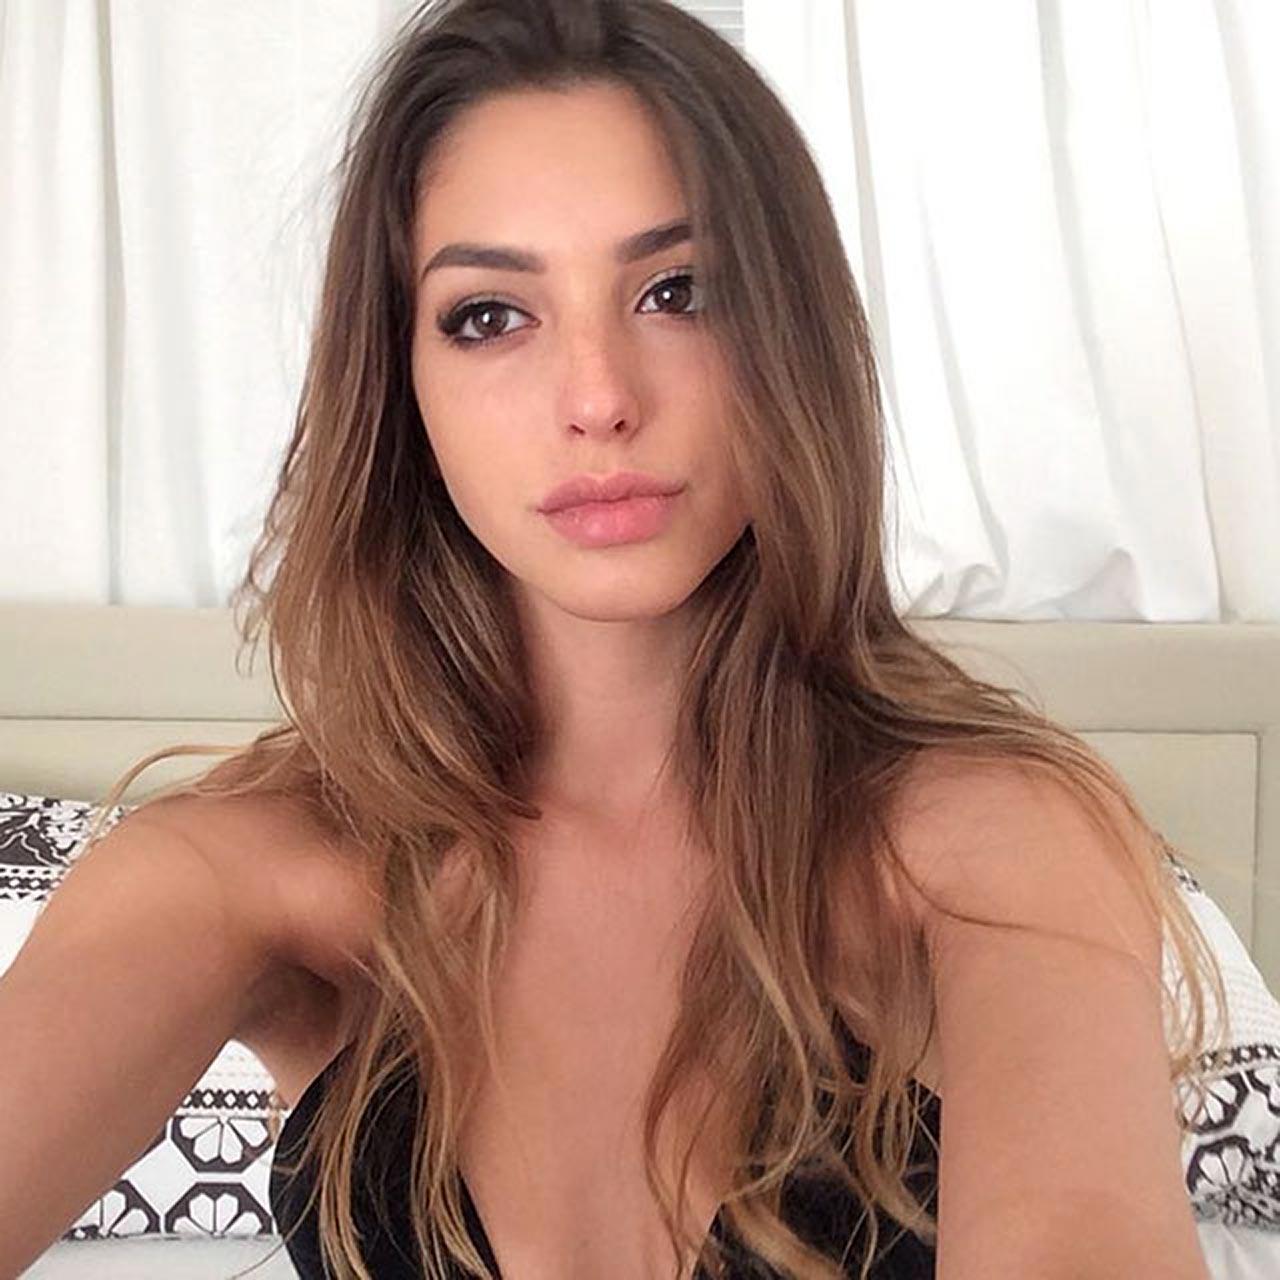 Nude colgate girl